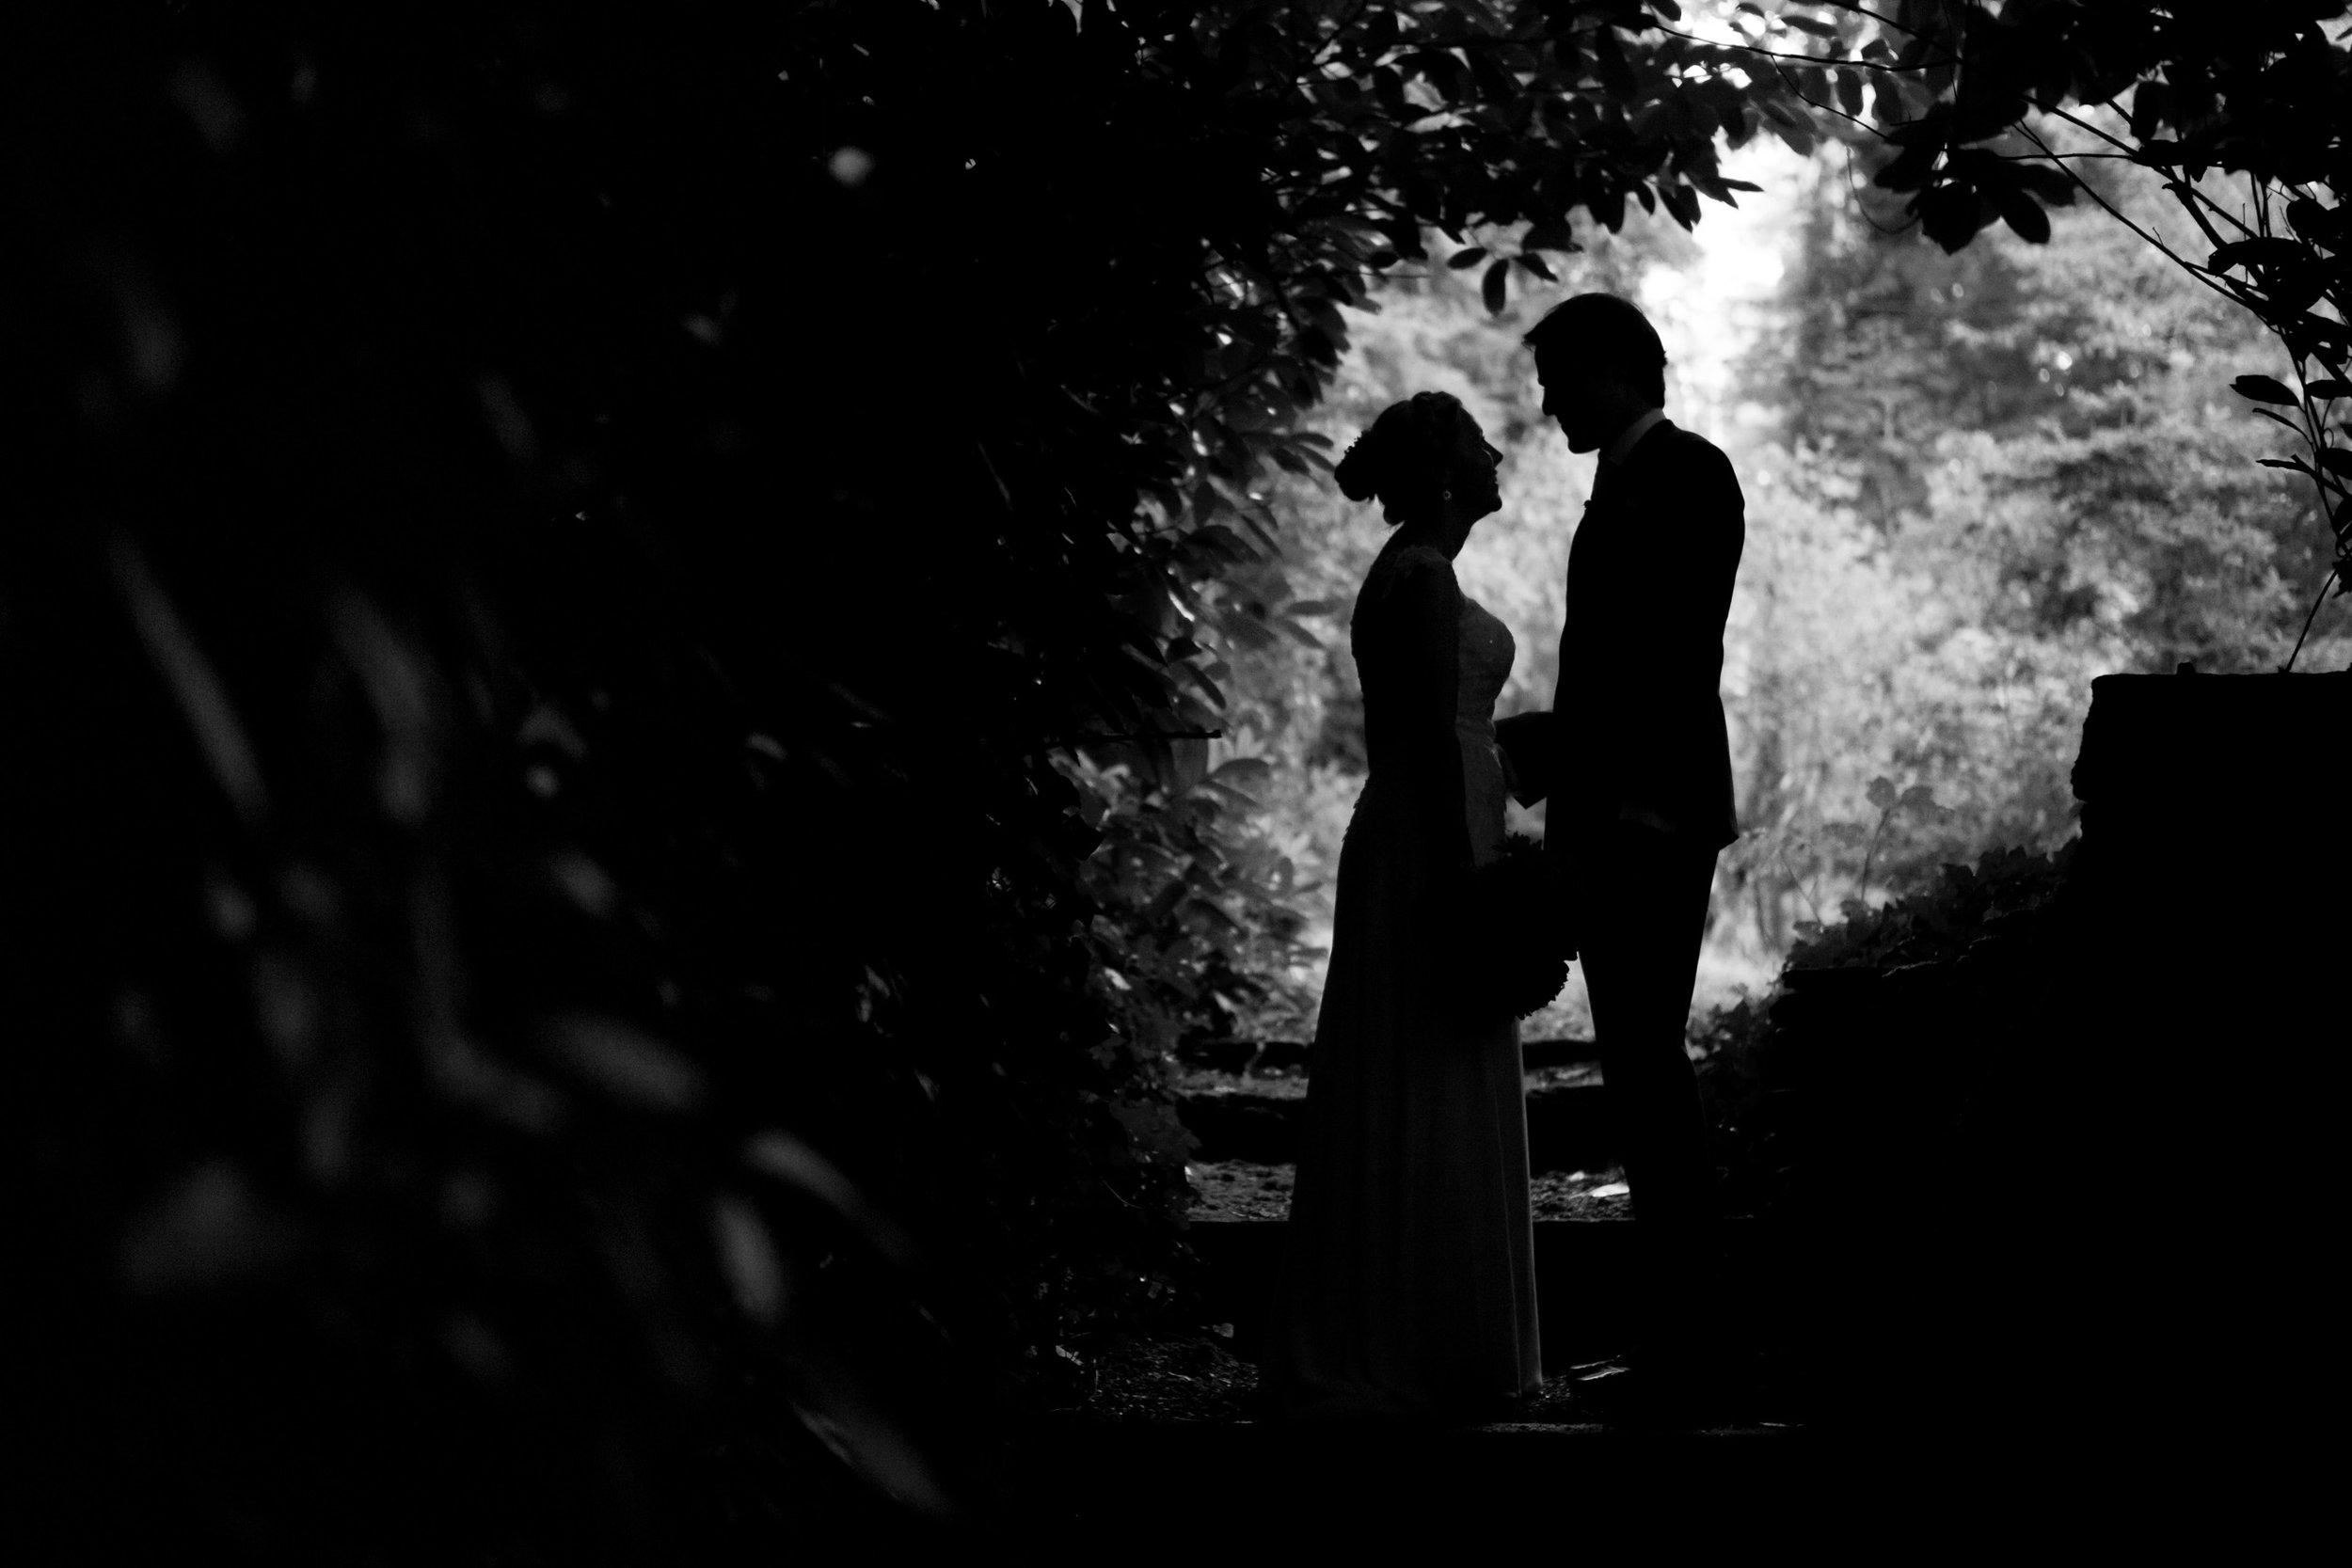 Bucklands-Tout-Saints-Hotel-Devon-Wedding-Photography-36.jpg